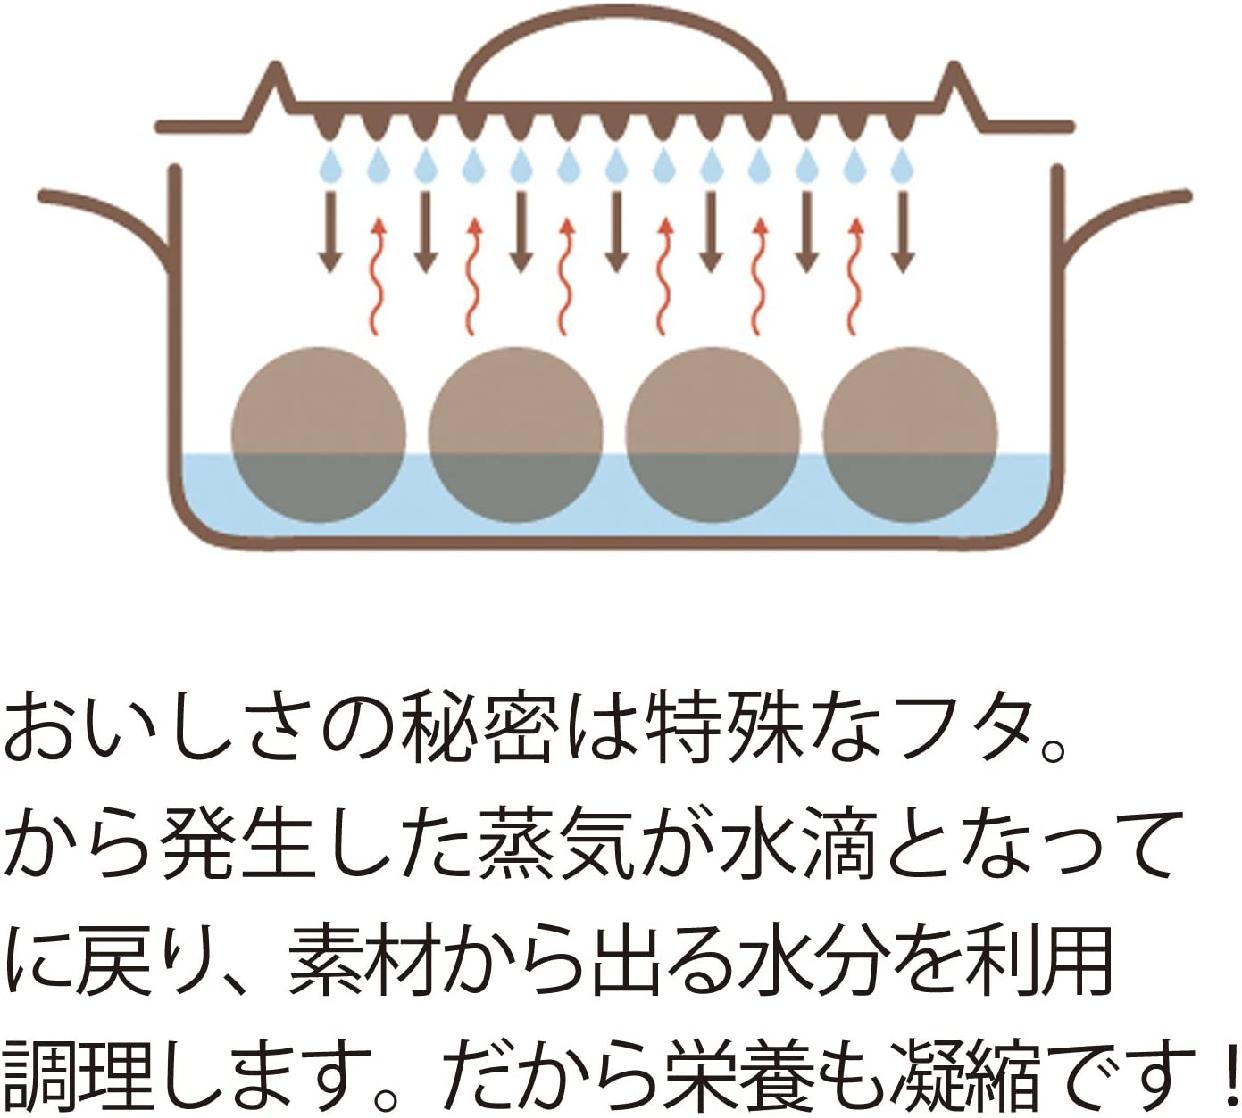 APEX HEART(アペックスハート) Mizuirazu鍋 MZ-1217の商品画像5